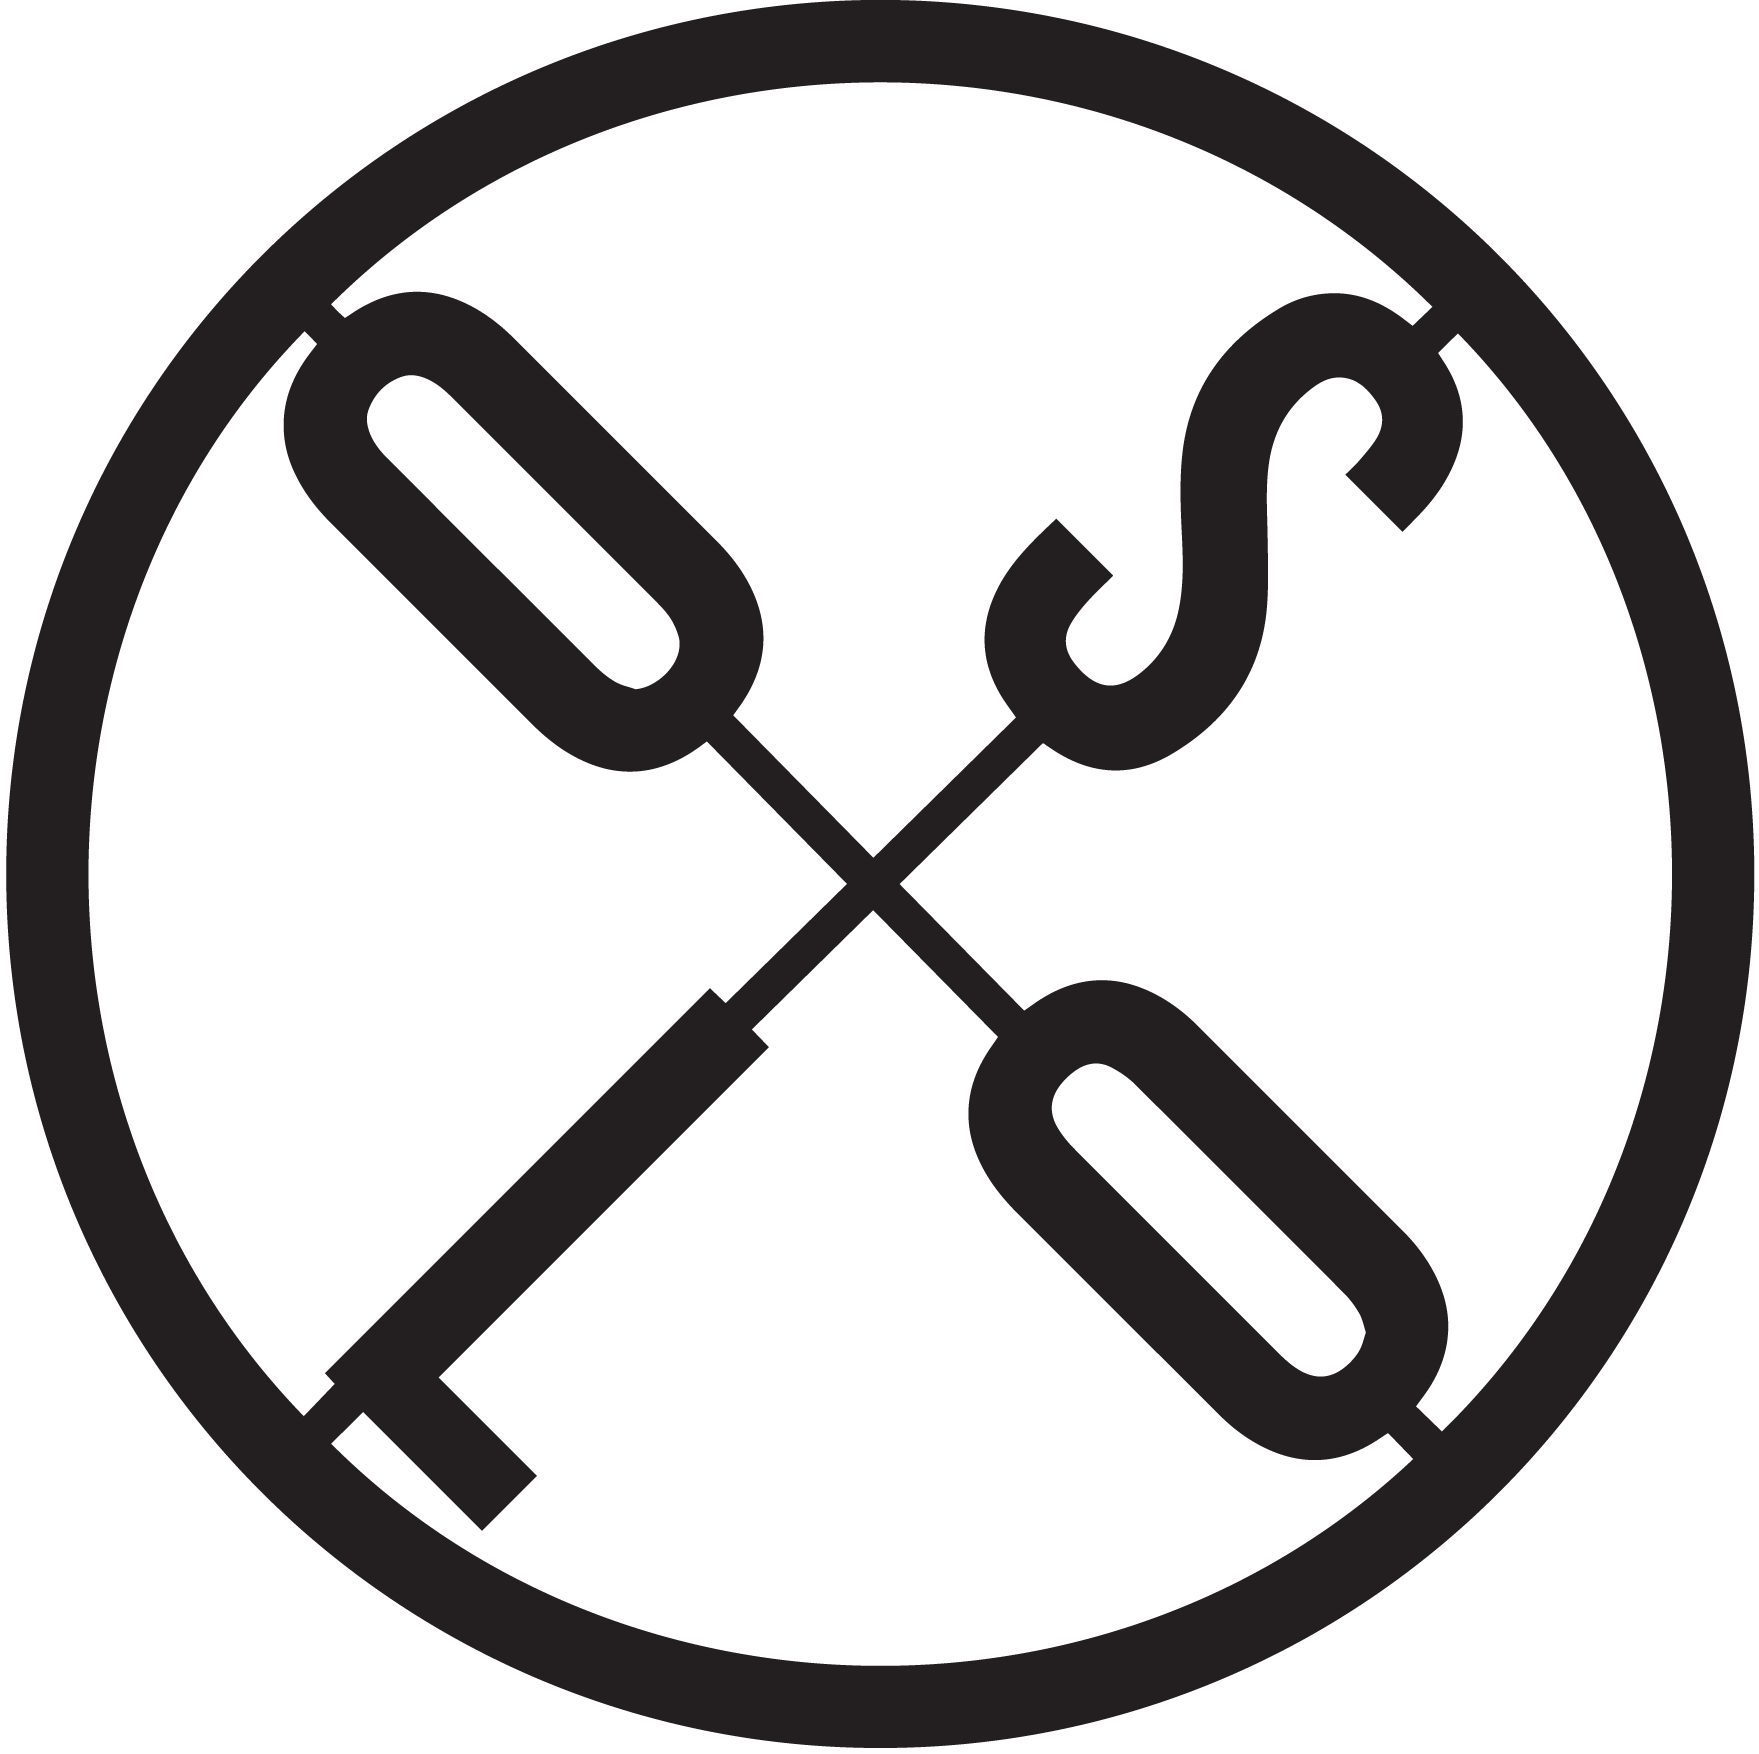 OSLO_logo_black.png